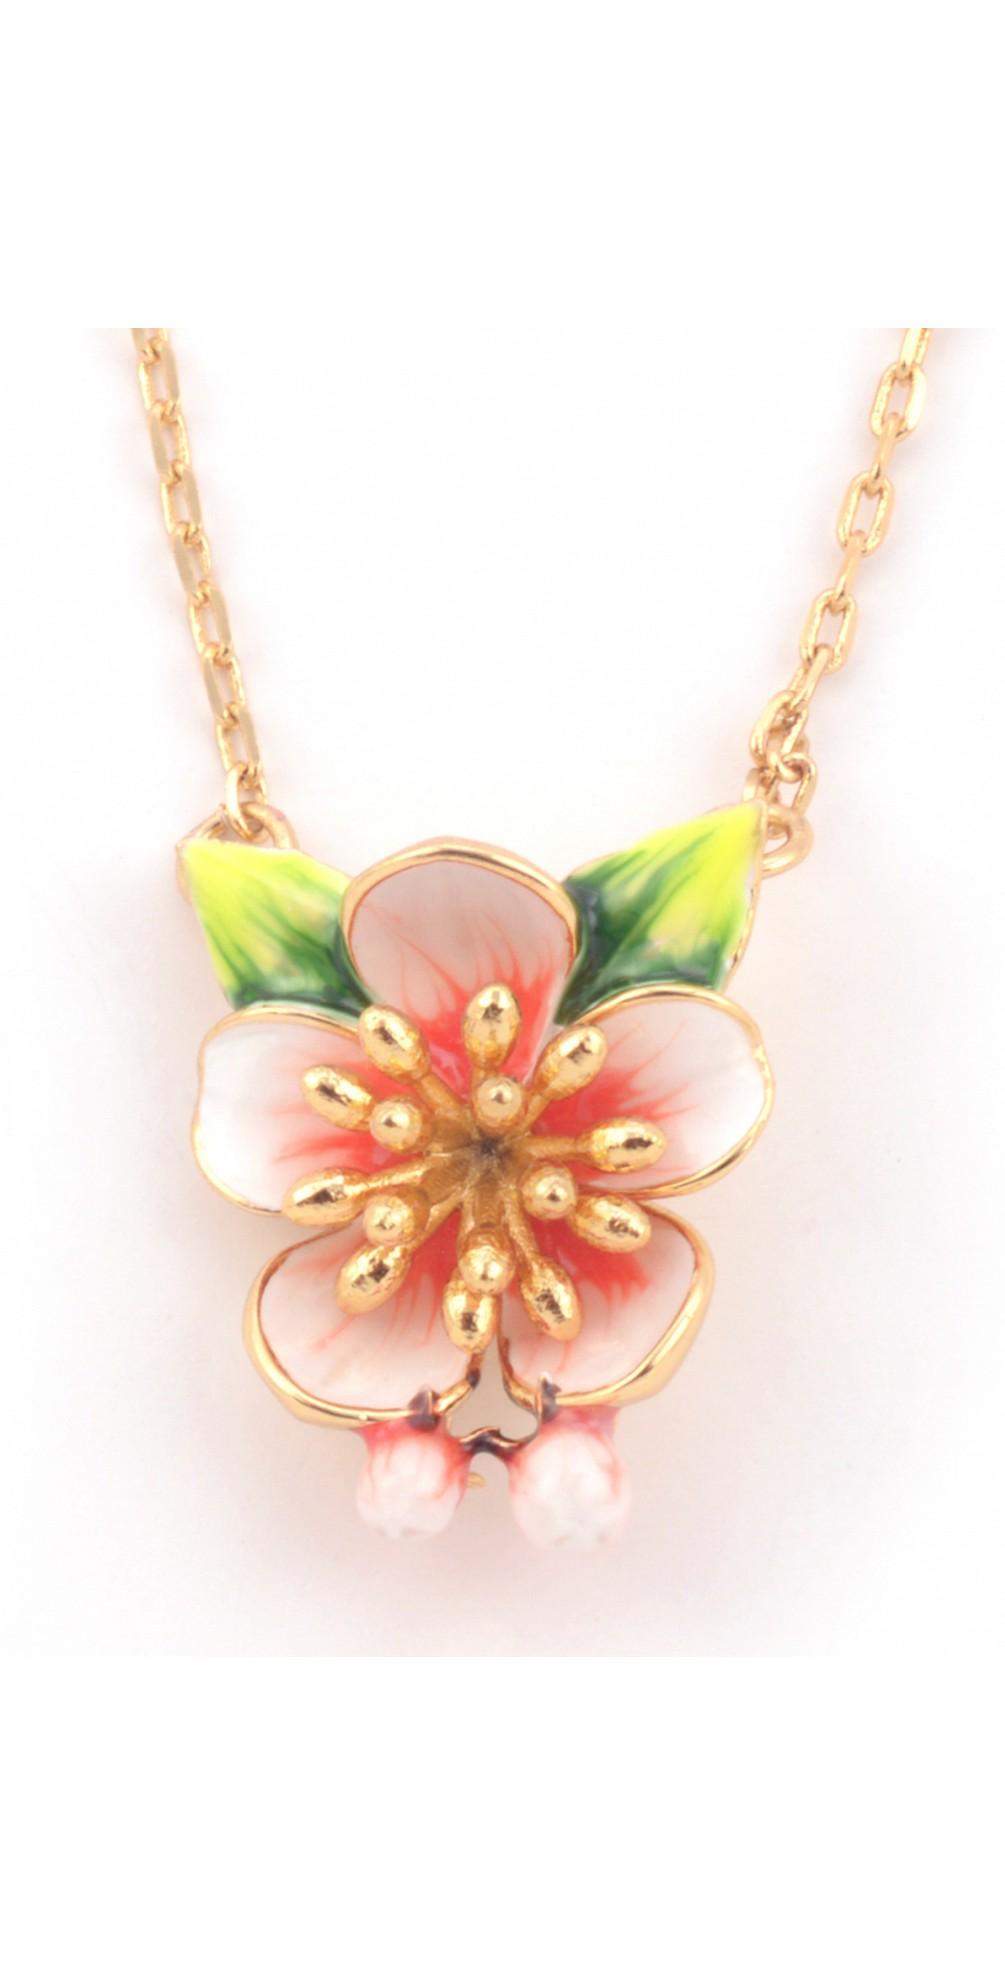 Apple Blossom Pendant necklace main image